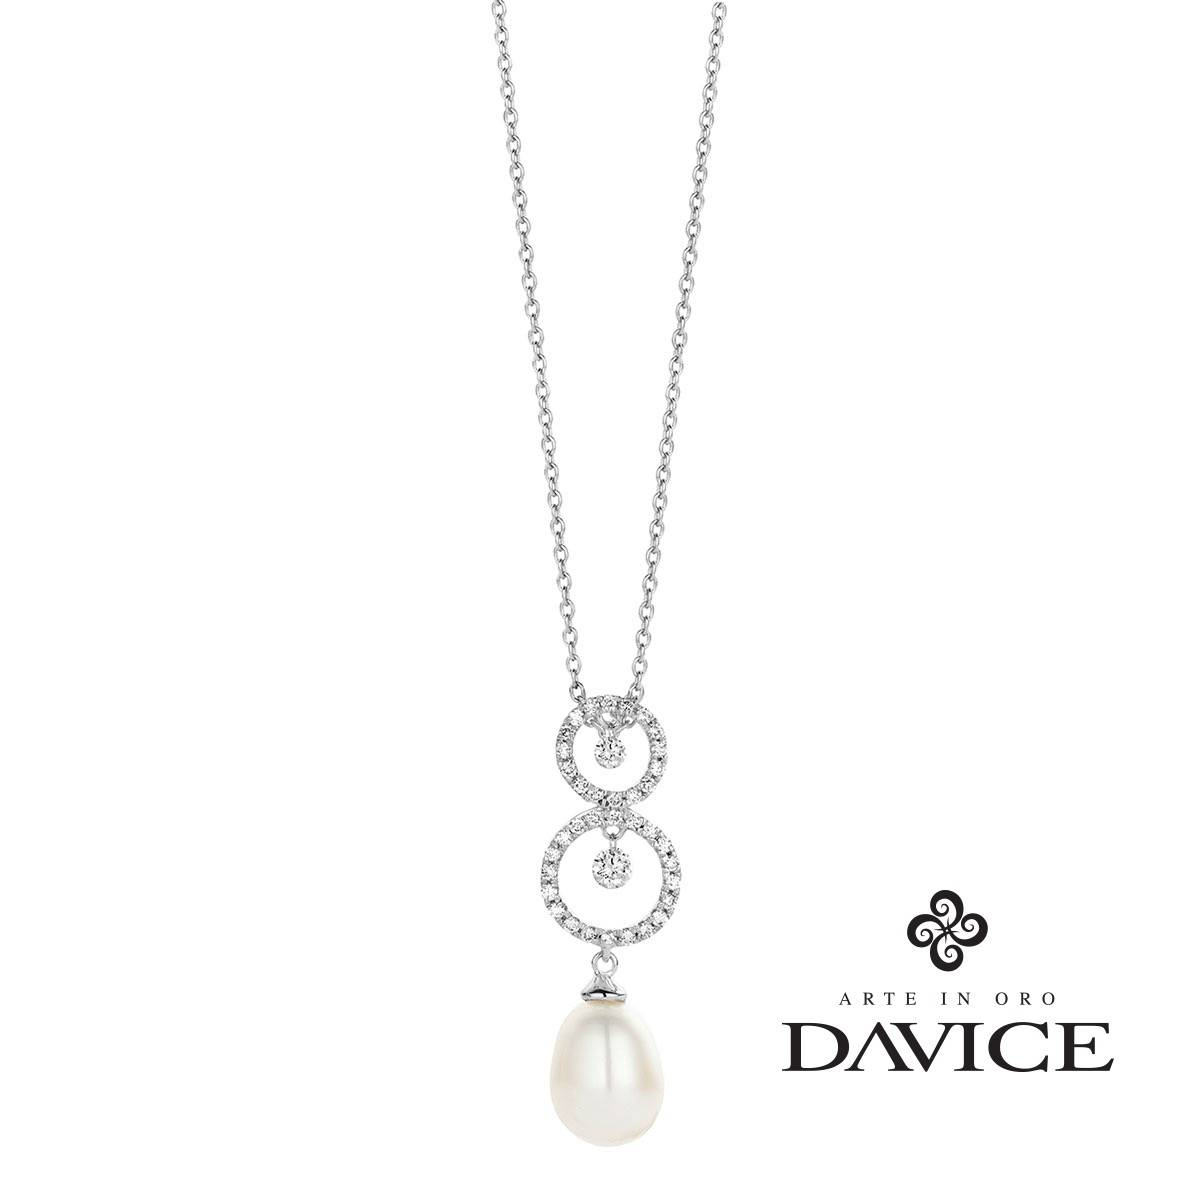 Juwelier Jan Maes - Trouwringen - Verlovingsringen - Juwelen - House of Weddings - 29